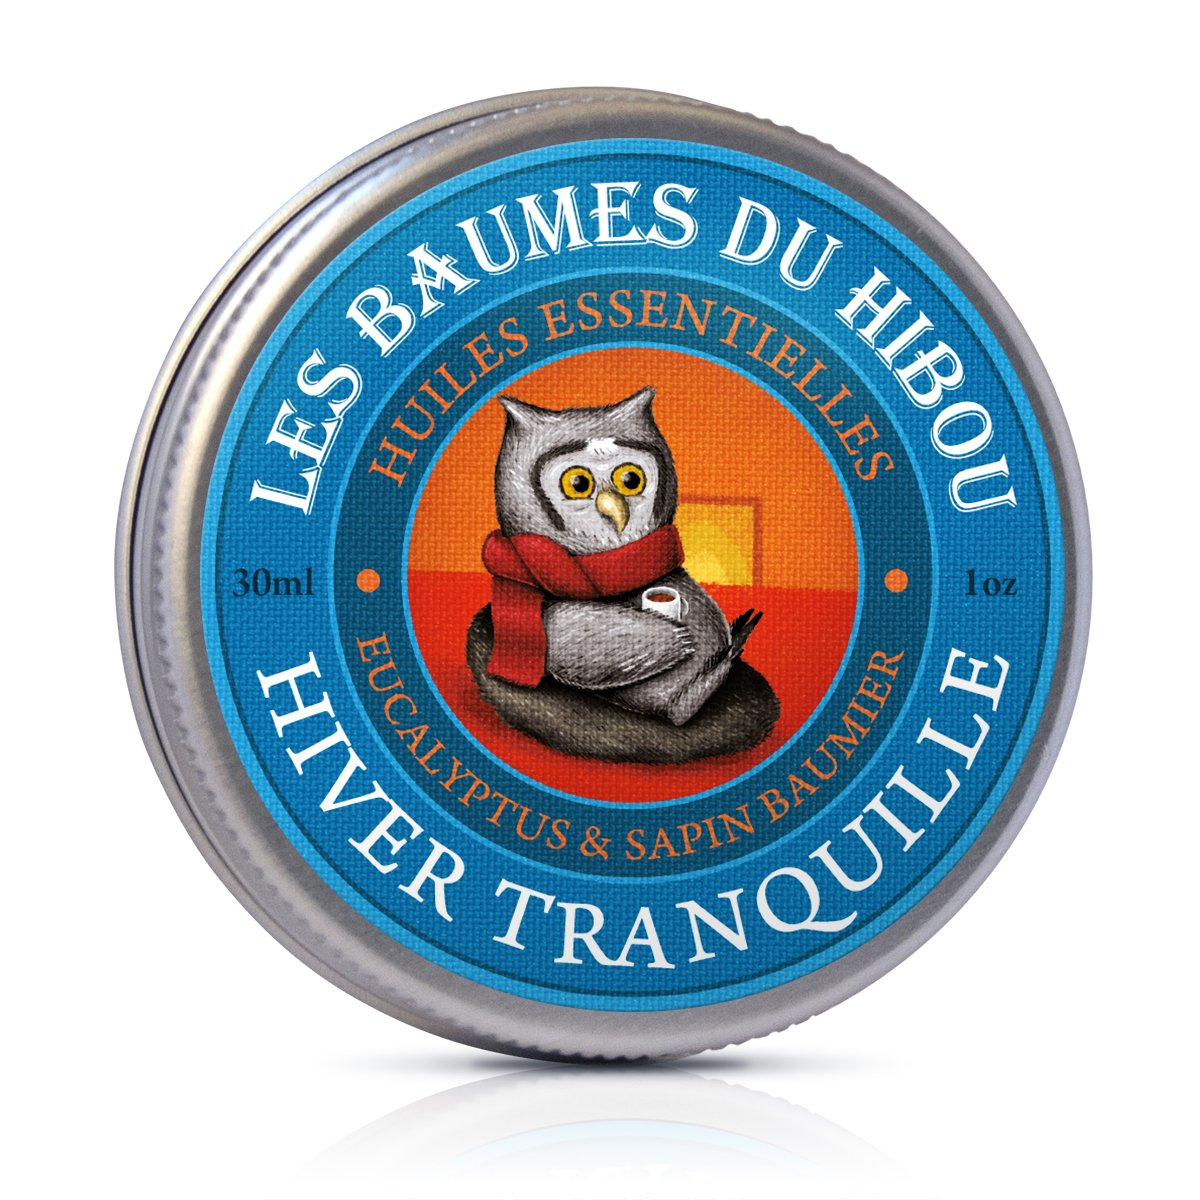 img-les-baumes-du-hibou-baume-hiver-tranquille-bio-30ml